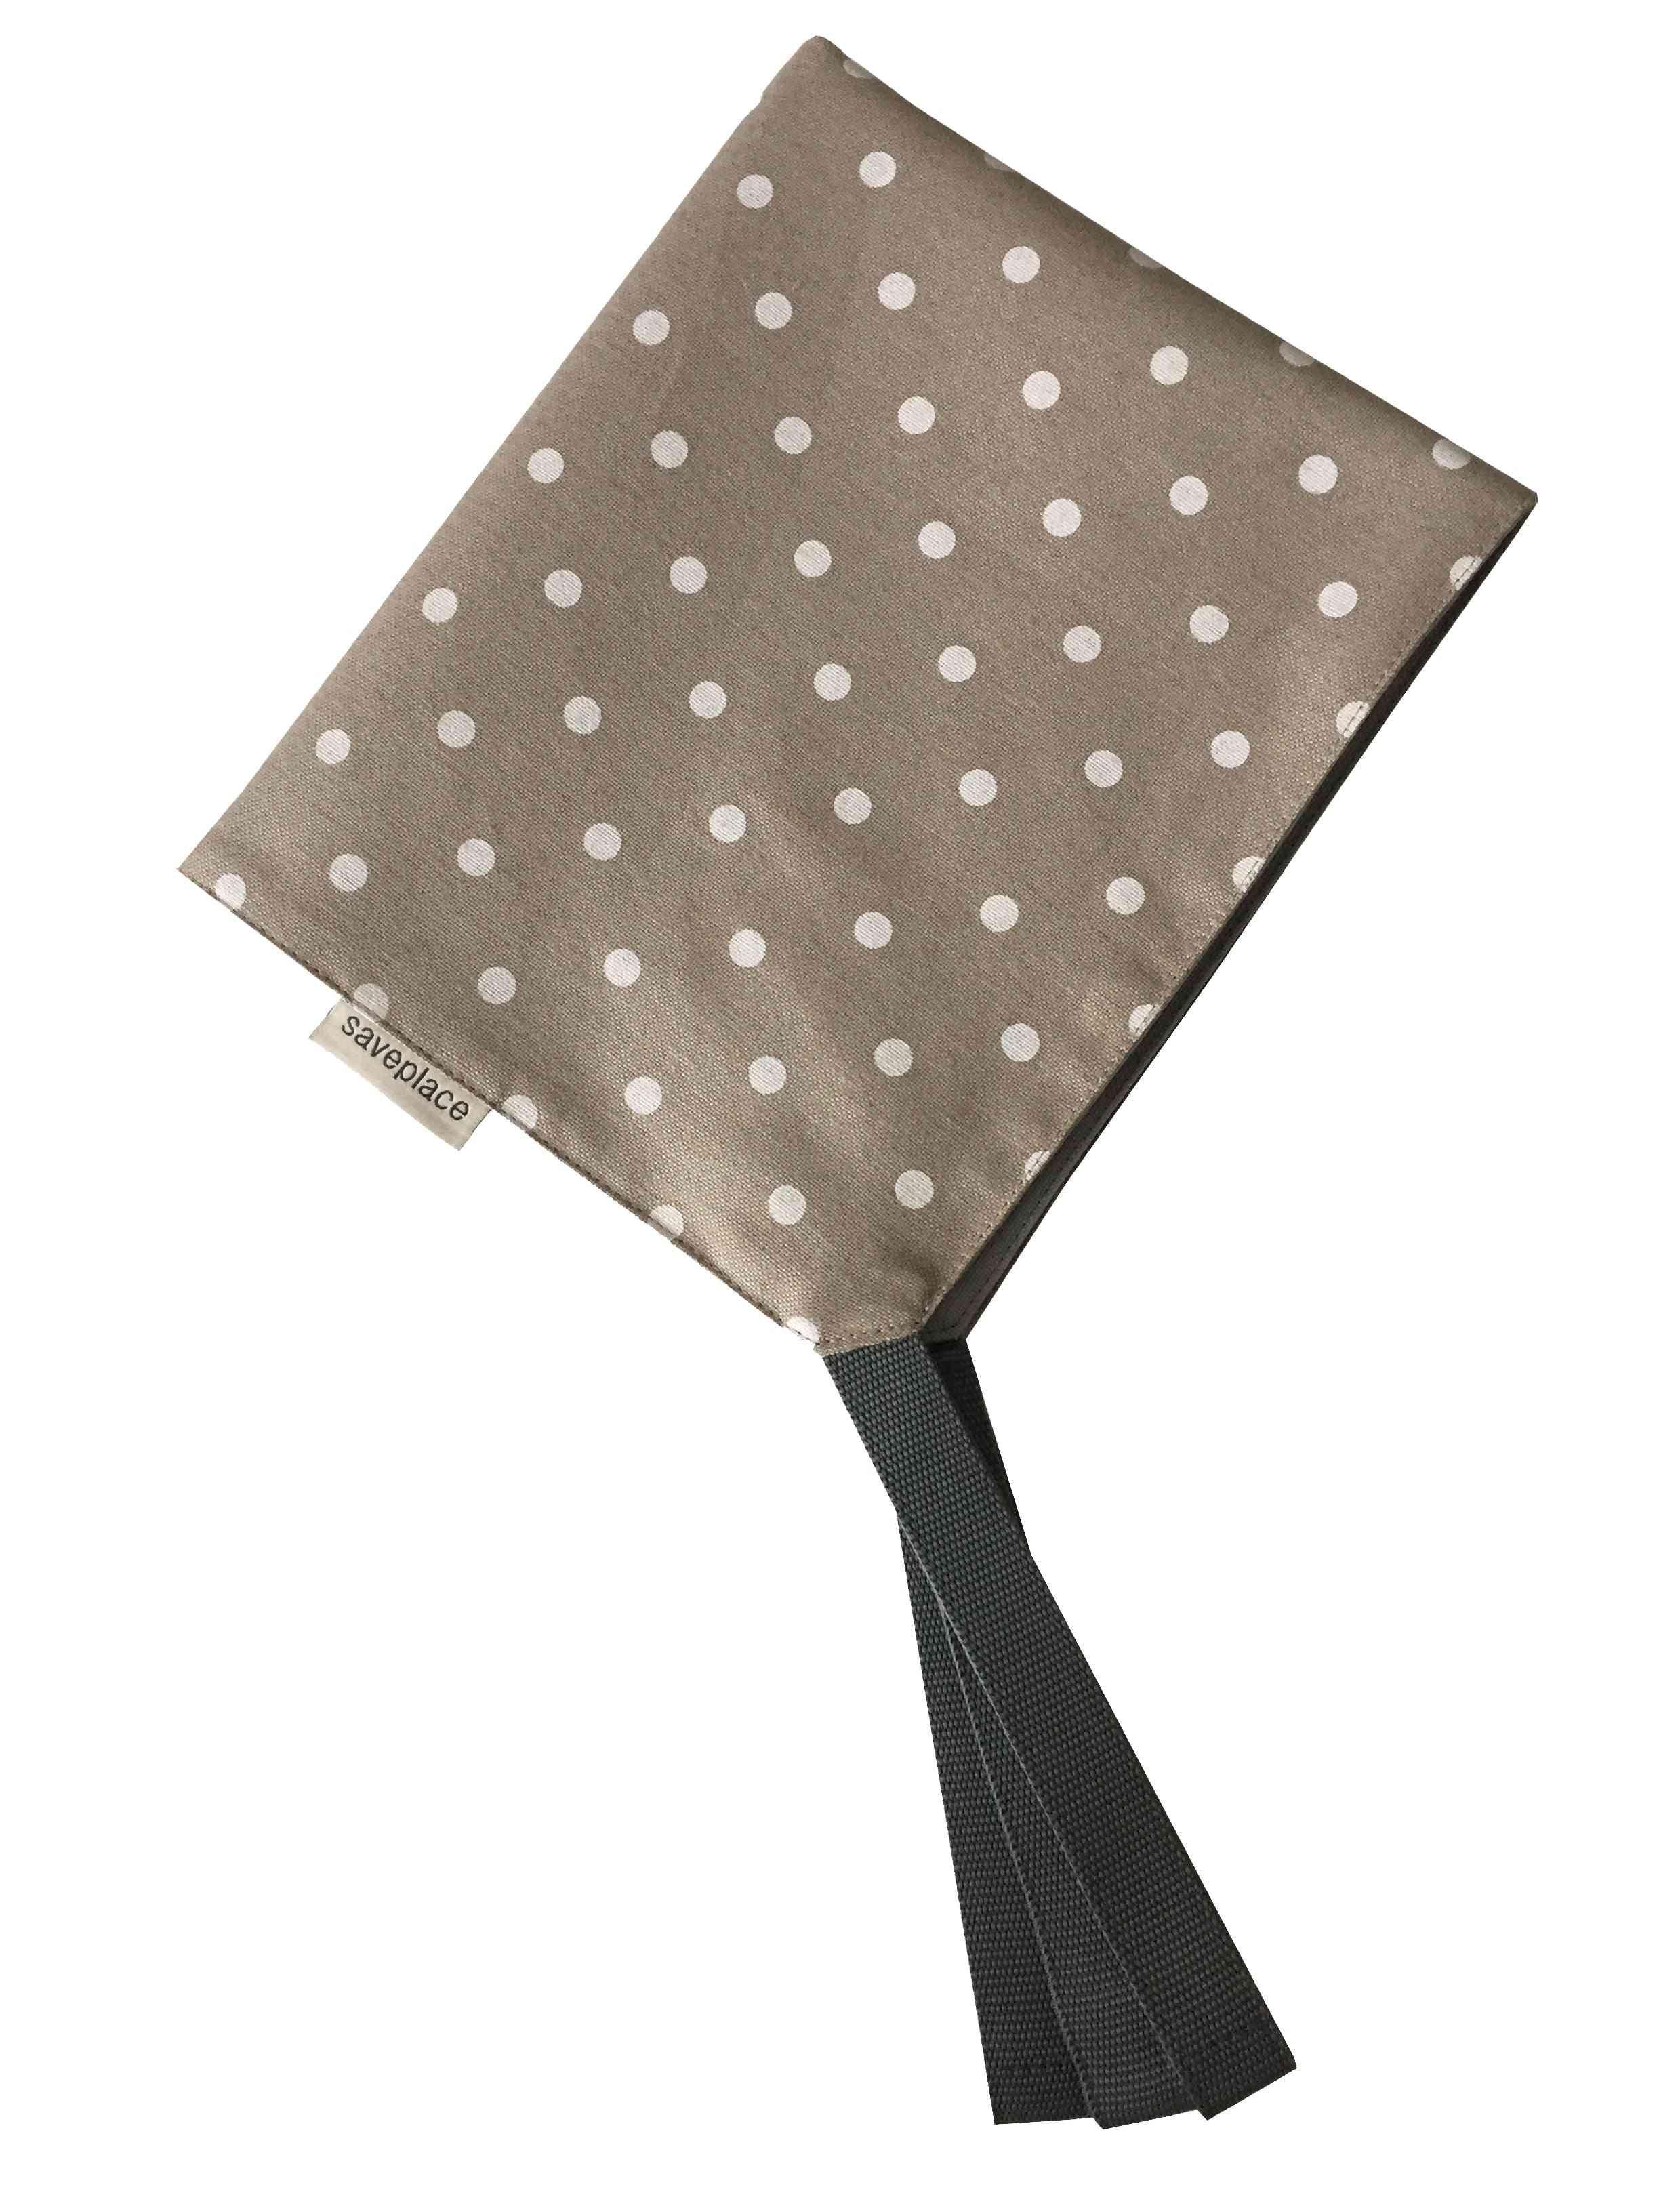 Saveplace® Chair Hanging Mat (cotton) - Happy Bubbles